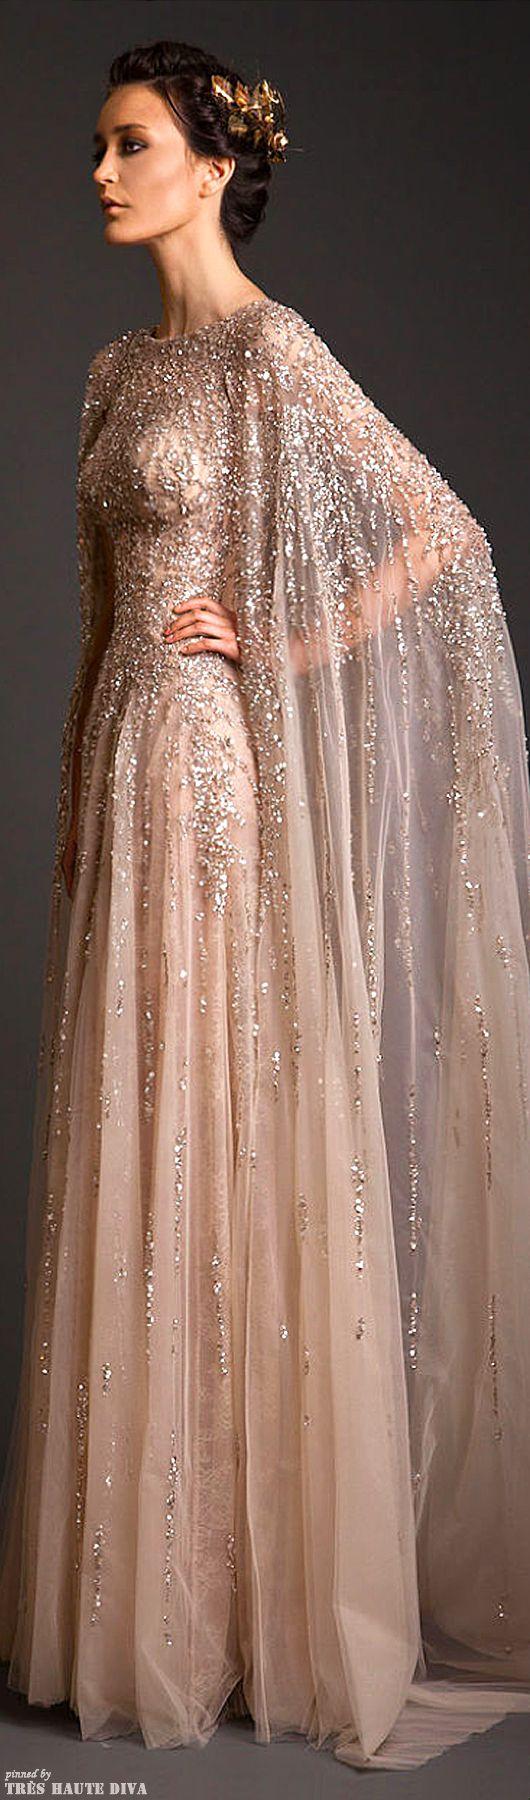 Krikor Jabotian Couture S/S 2014.